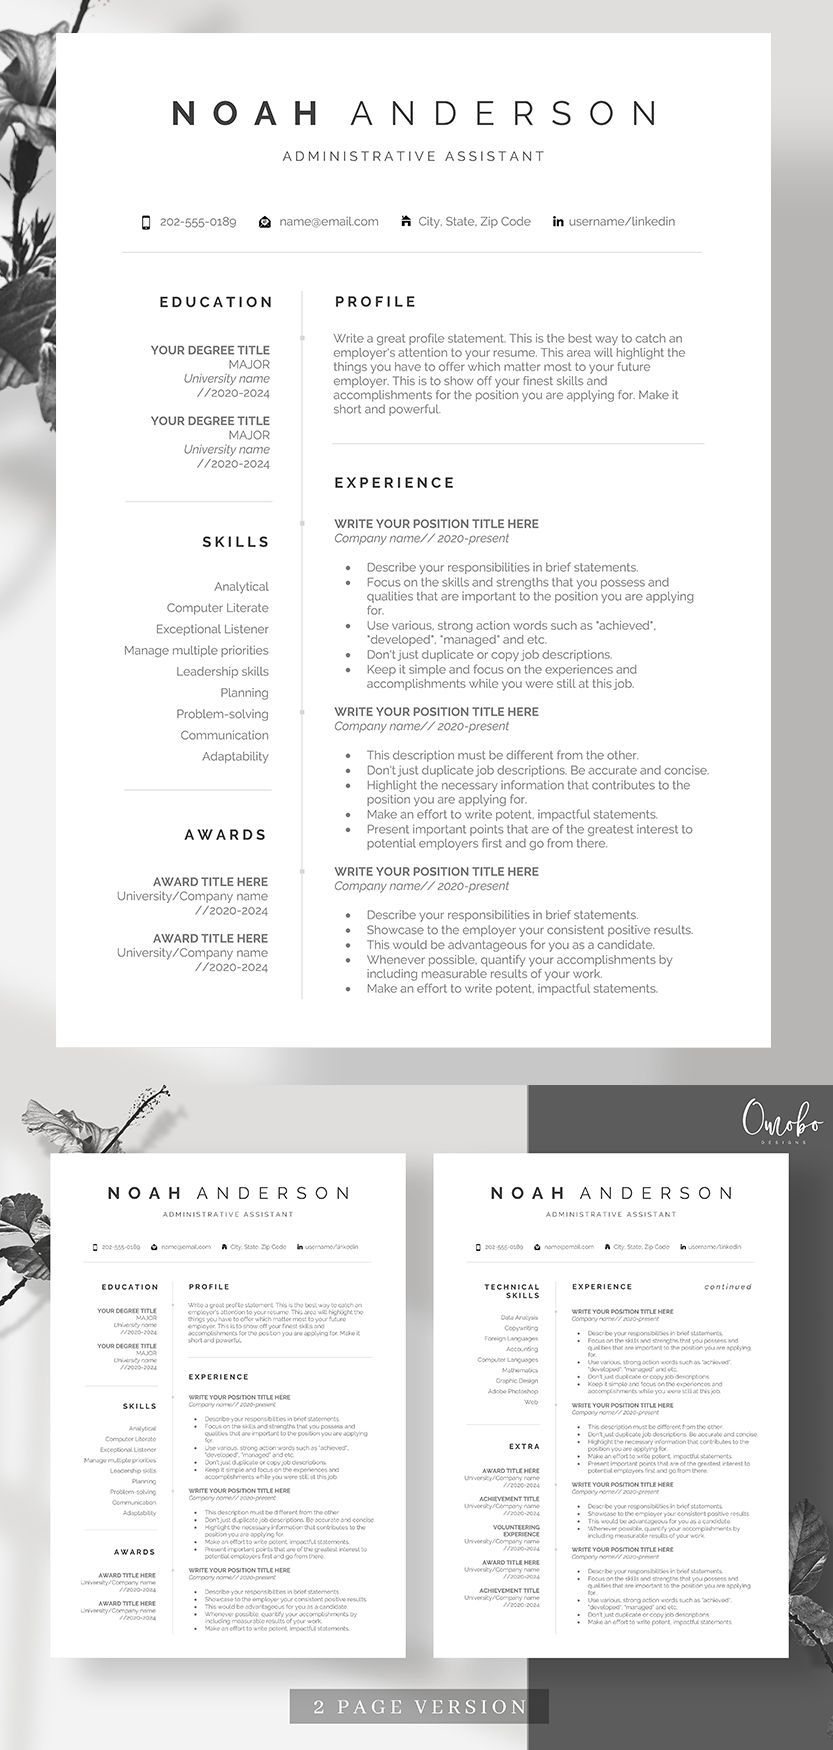 Resume, Resume template, Professional resume template